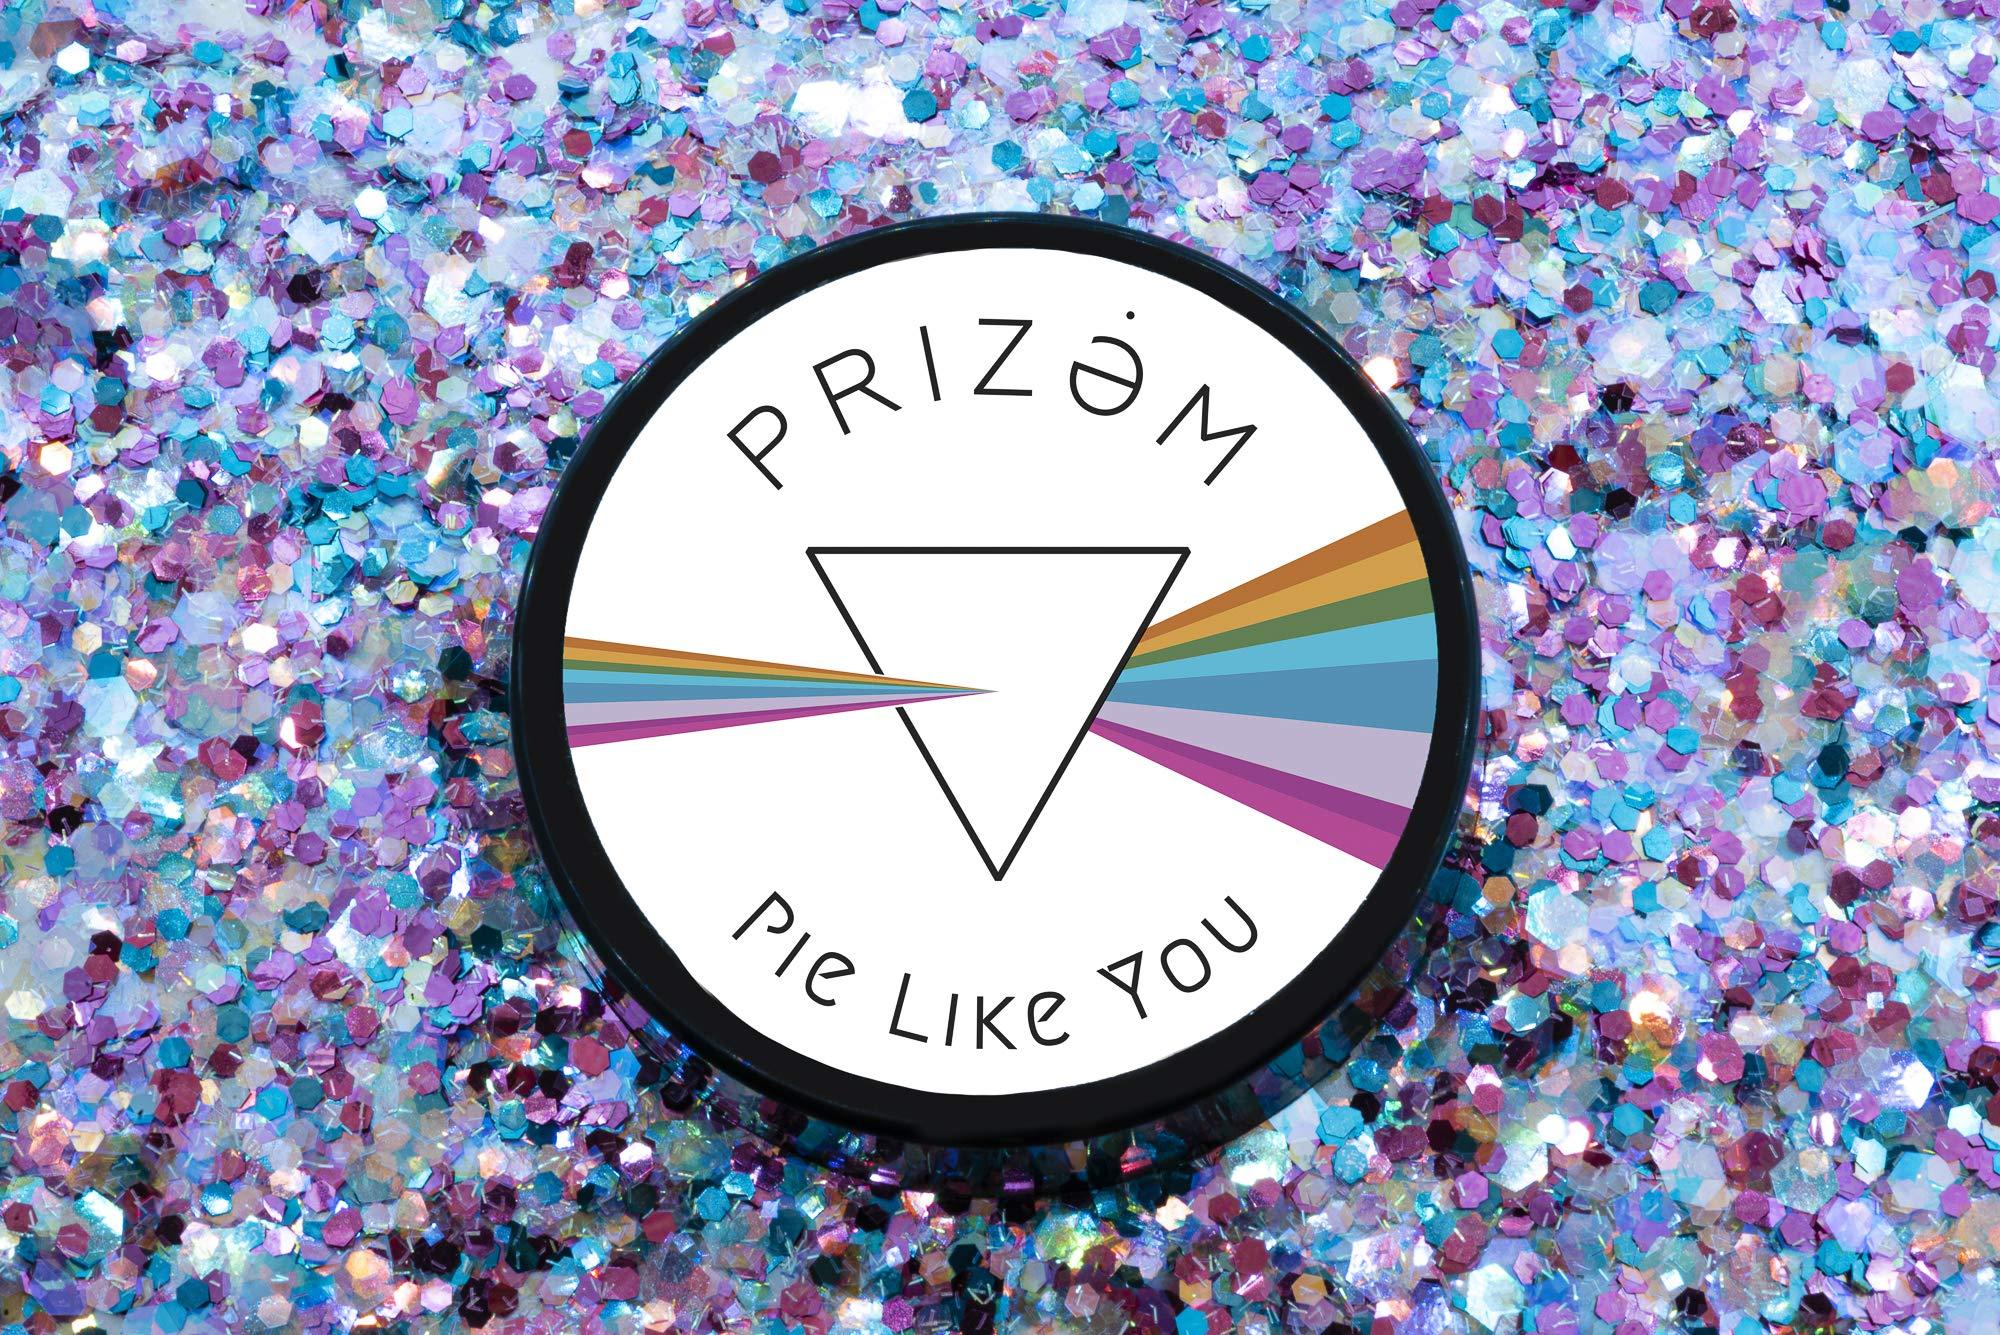 Prizem Pie Like You Biodegradable Glitter ▽60g▽ Festival Glitter , Chunky Glitter , Makeup Glitter , Face Glitter , Body Glitter , Glitter Makeup , Hair Glitter , Cosmetic Glitter , Nail Glitter by Prizem